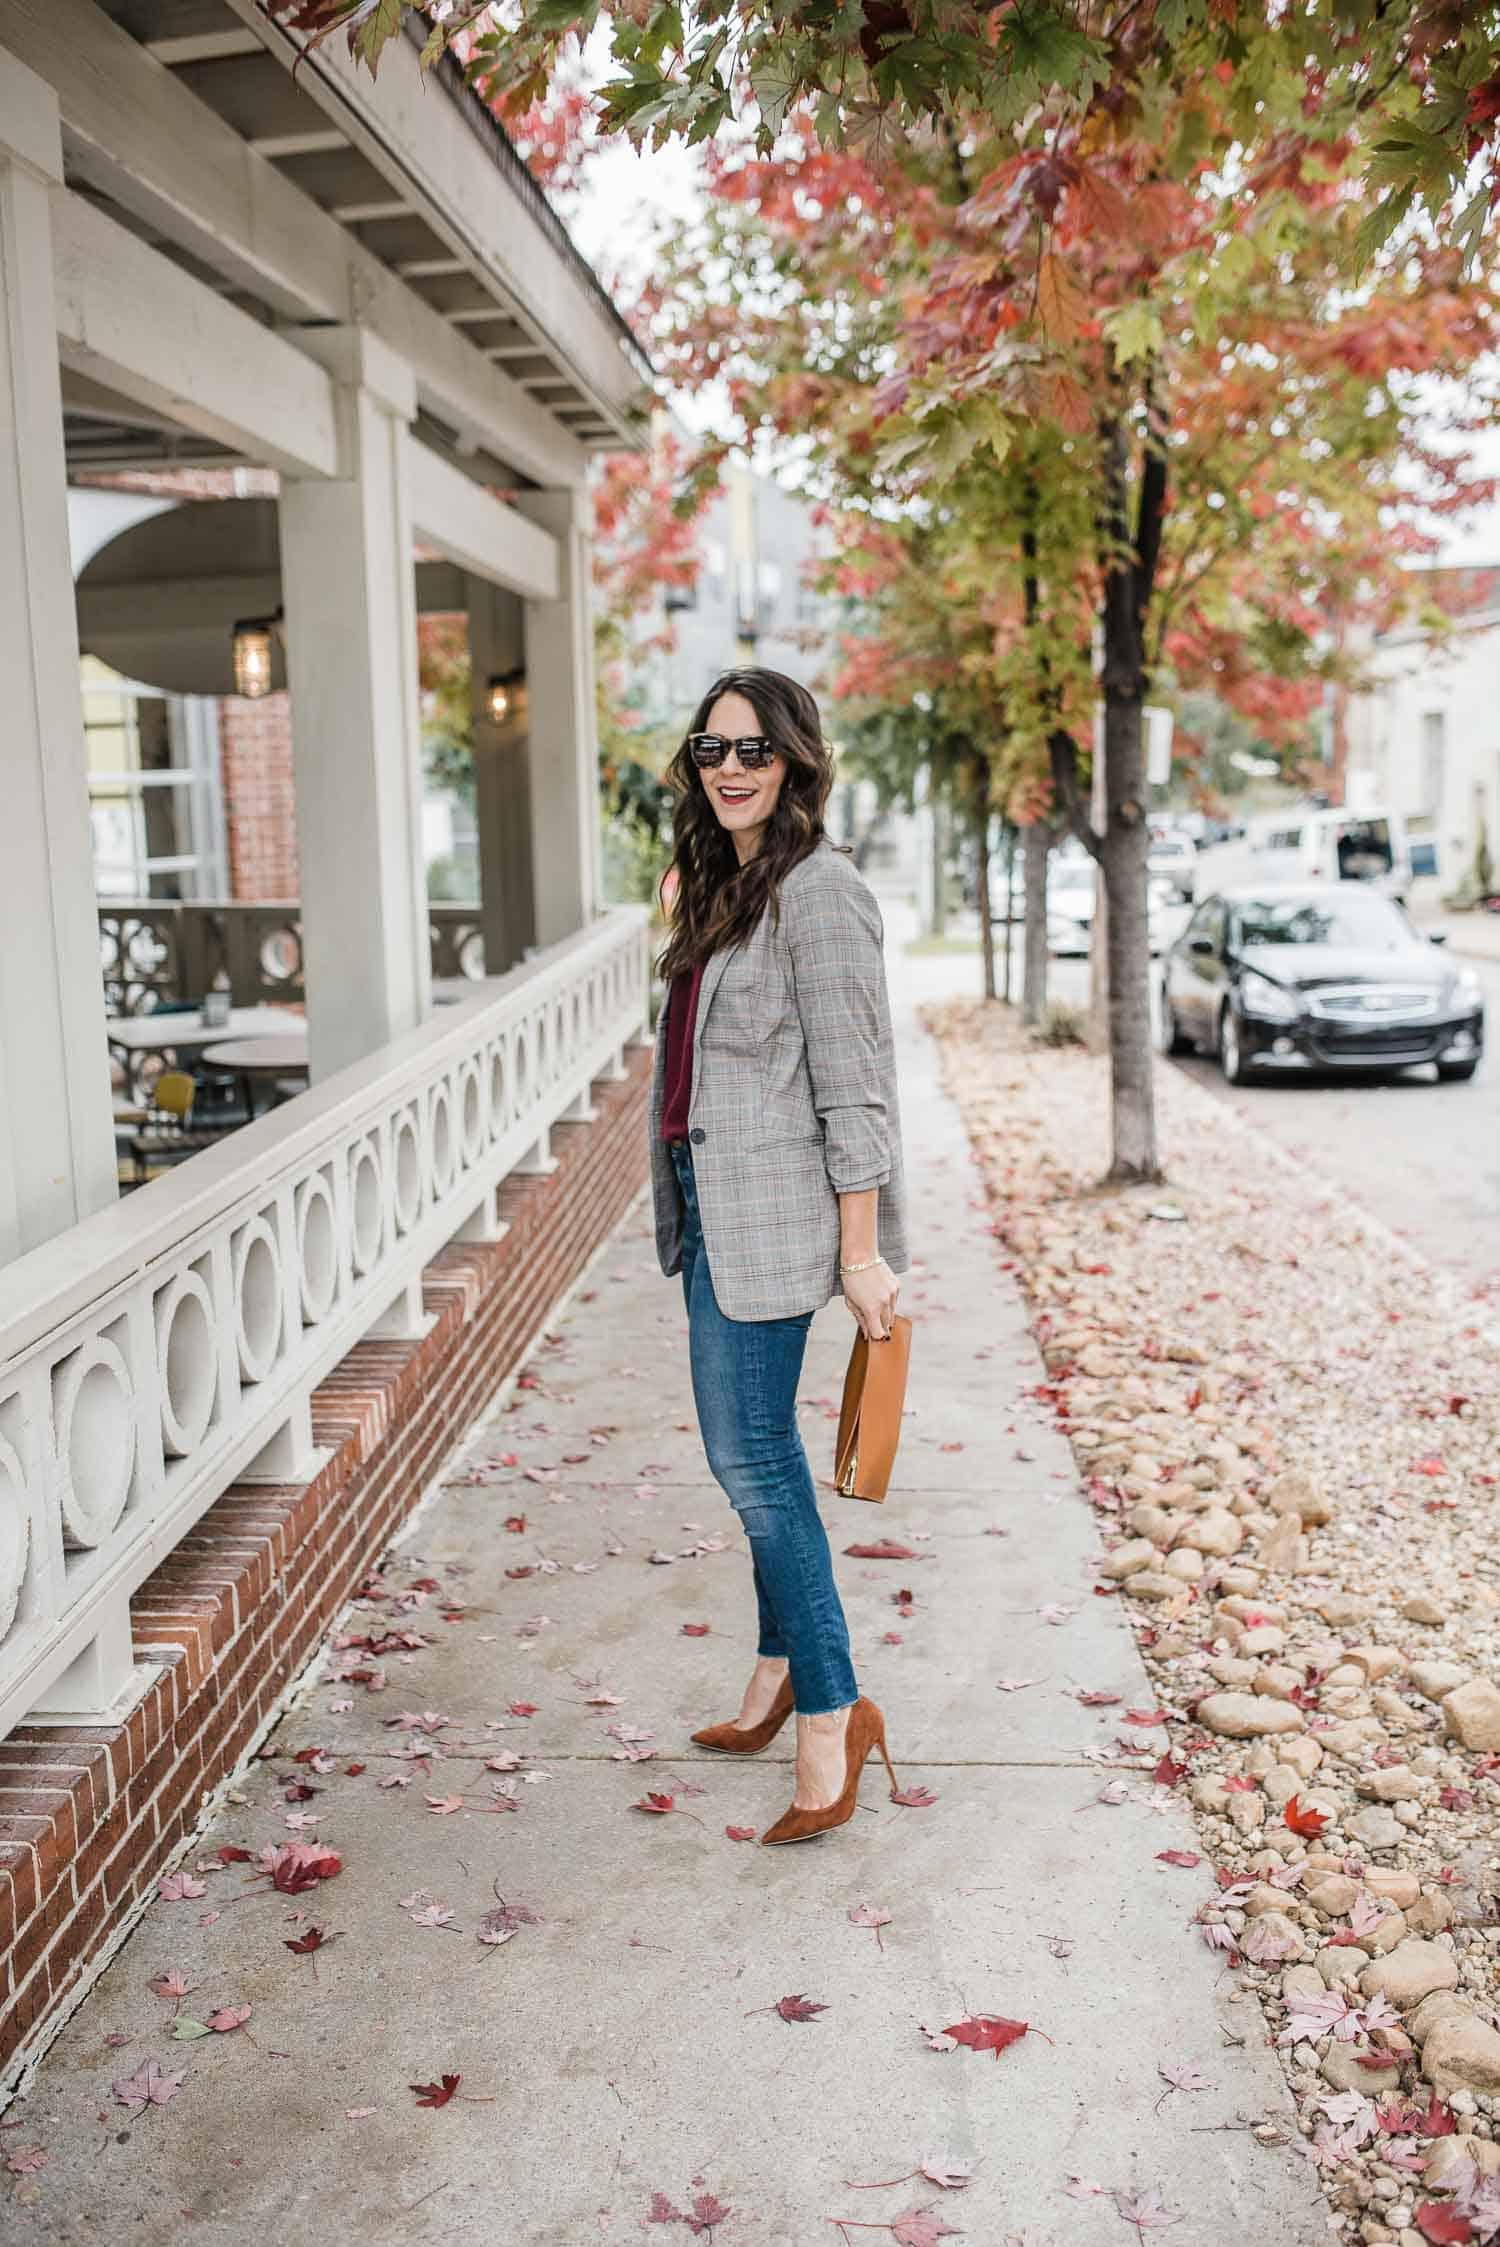 Outfit Details: Express Blazer and Sweater • Madewell Jeans • Steve Madden Heels (under $100) • Gigi NY Bag • Karen Walker Sunglasses